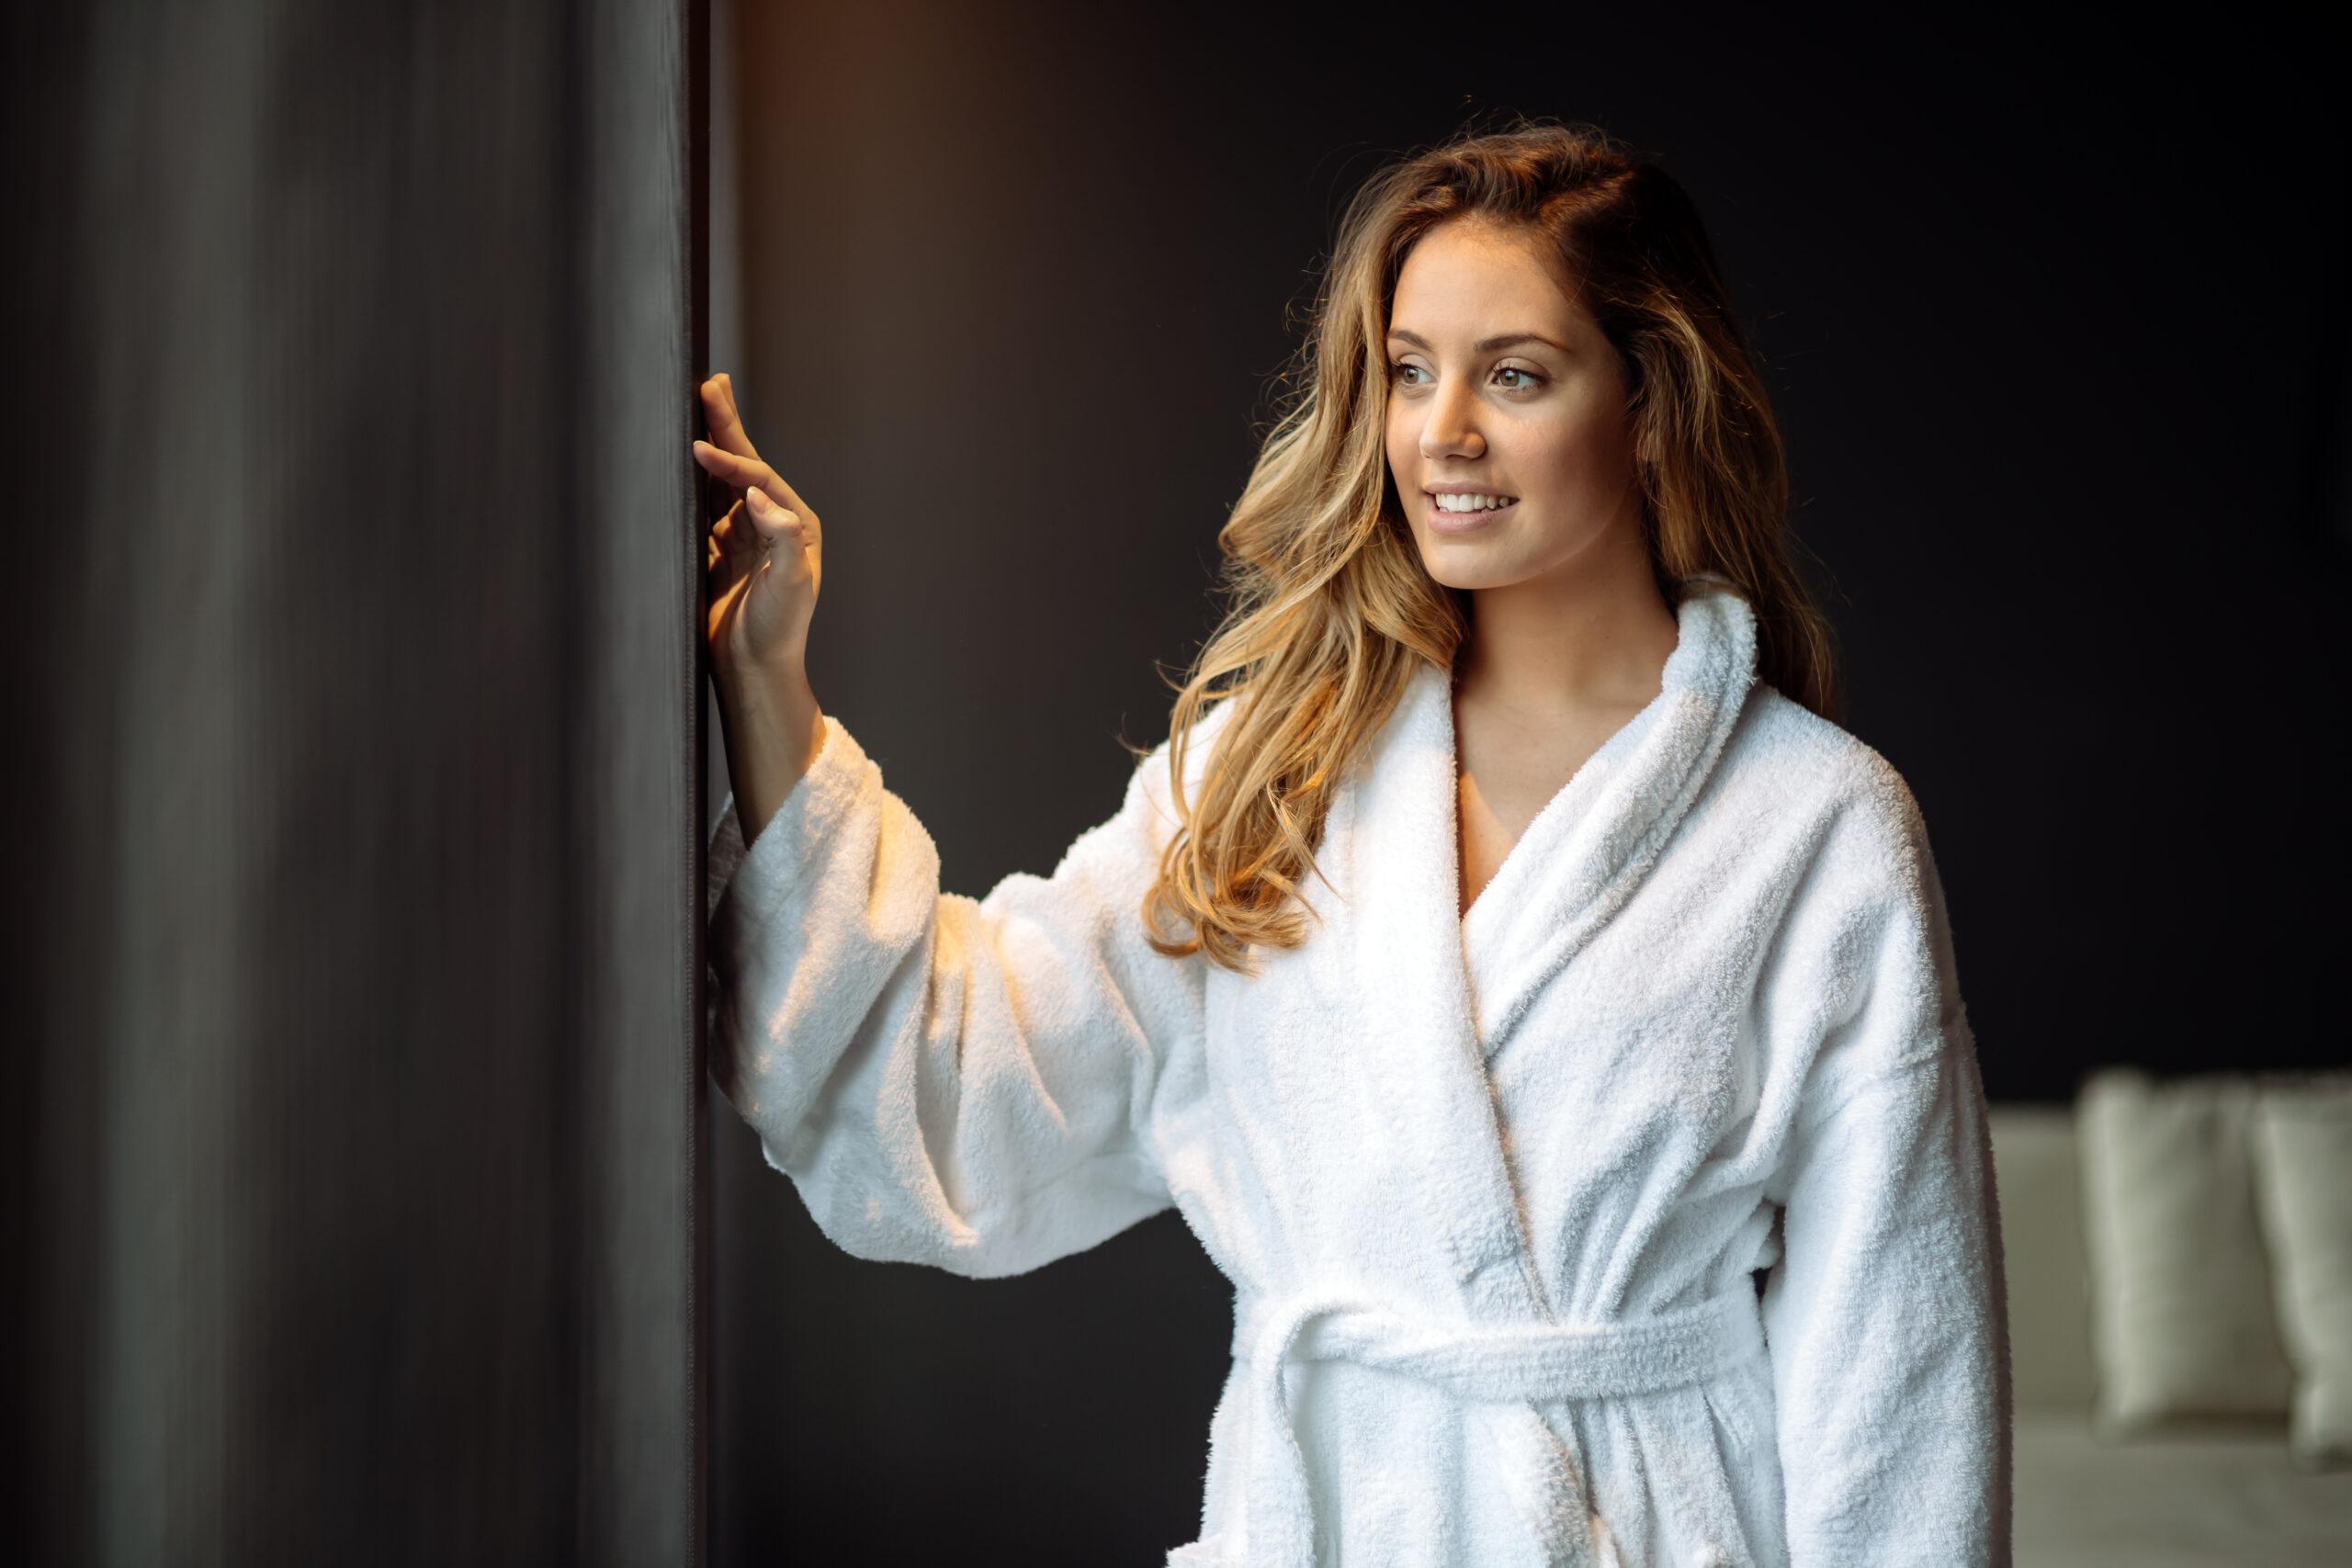 Stunning woman in bathrobe enjoying wellness weekend